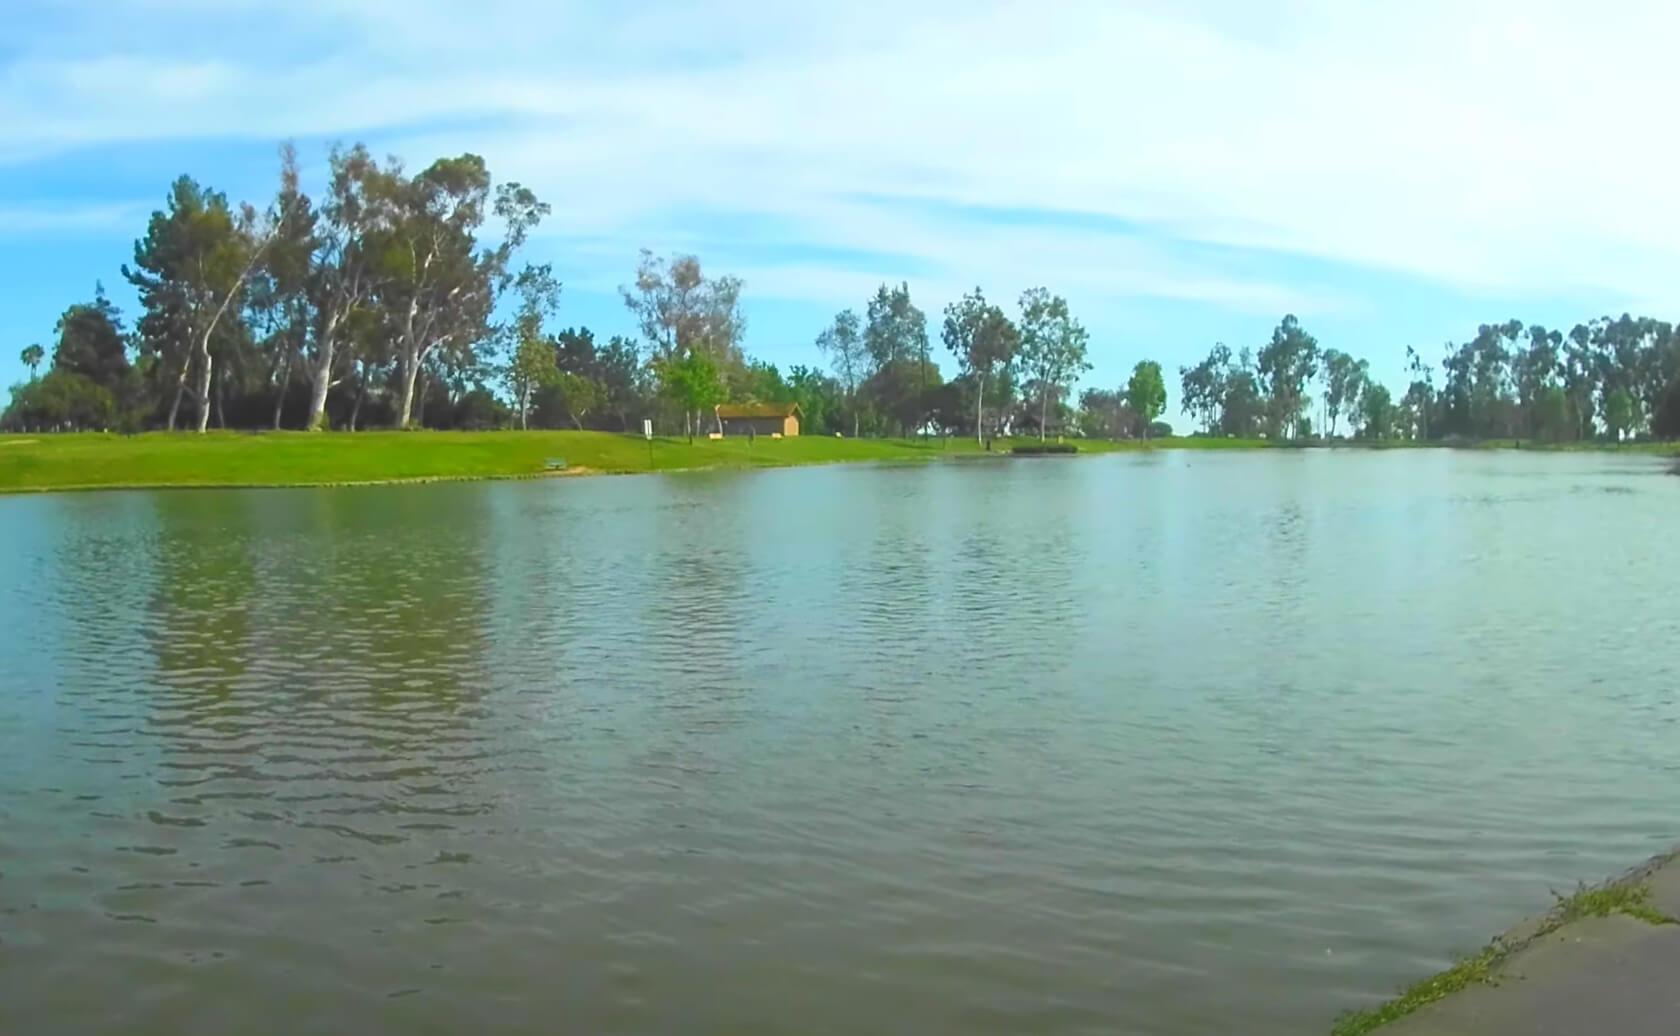 Tri-City-Park-Lake-Fishing-Guide-Report-Placentia-CA-05